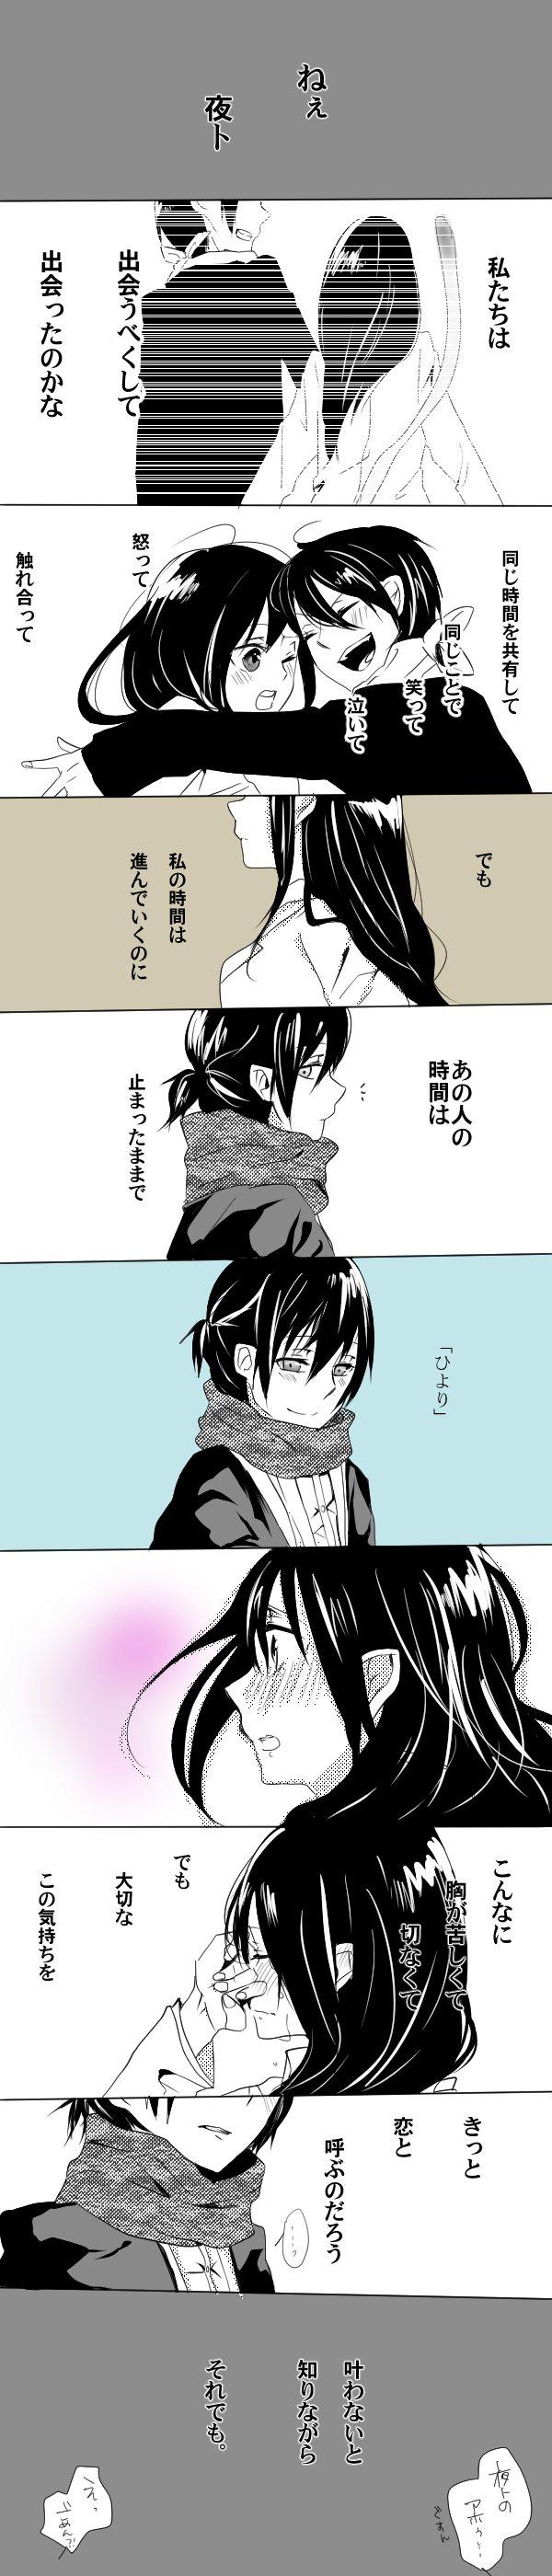 Tags: Anime, Pixiv Id 7542053, Noragami, Iki Hiyori, Yato (Noragami), Comic, Translation Request